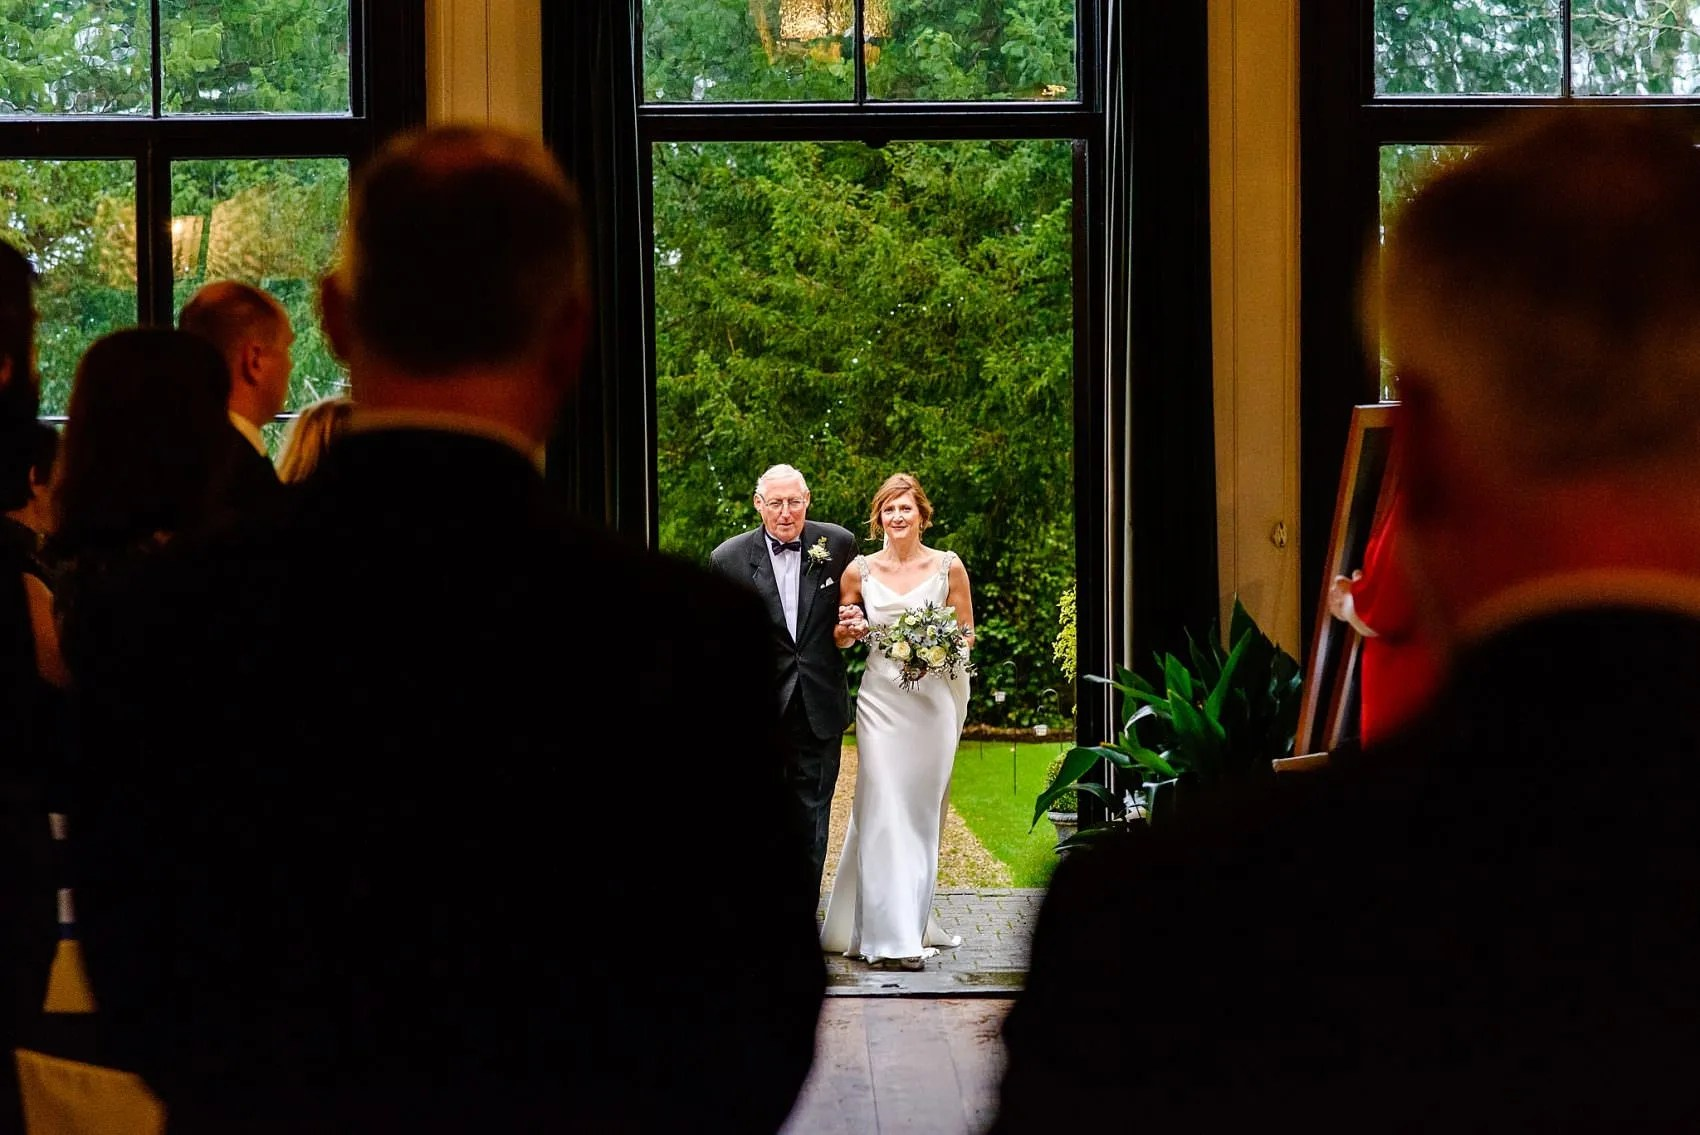 Larmer-Tree-wedding0026